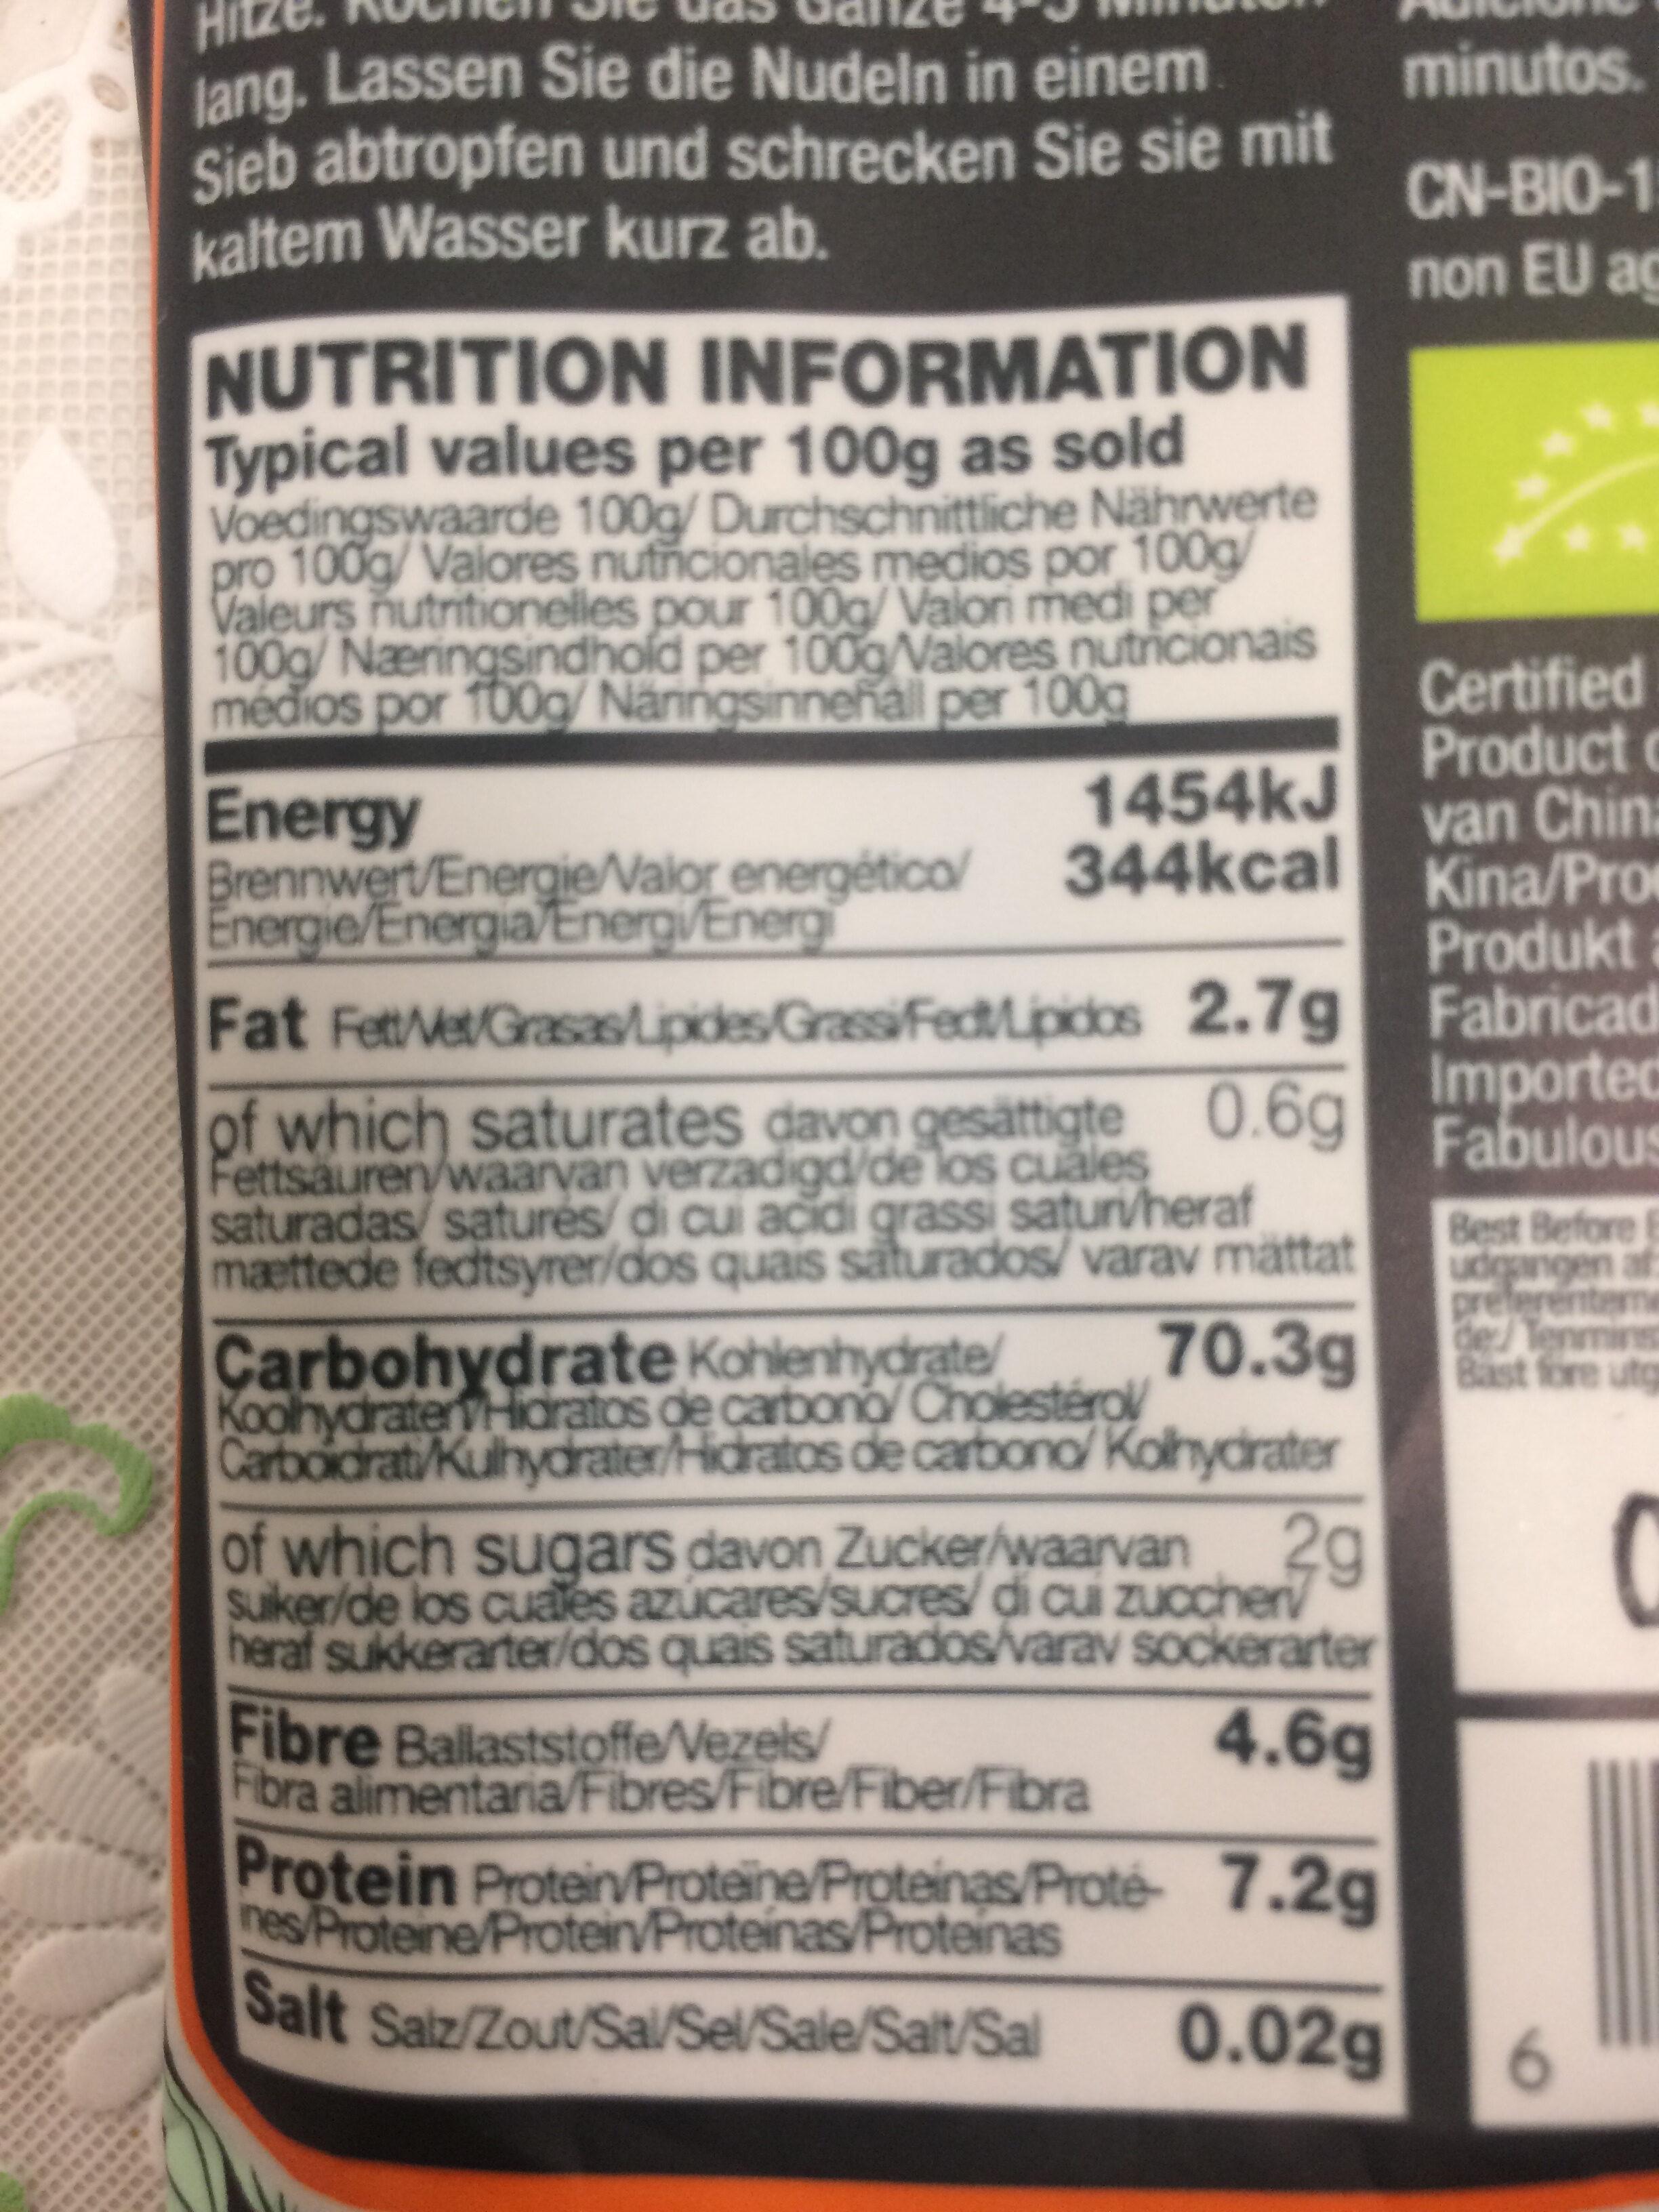 Pumpkin, Ginger & Rice Noodles - Informació nutricional - pt